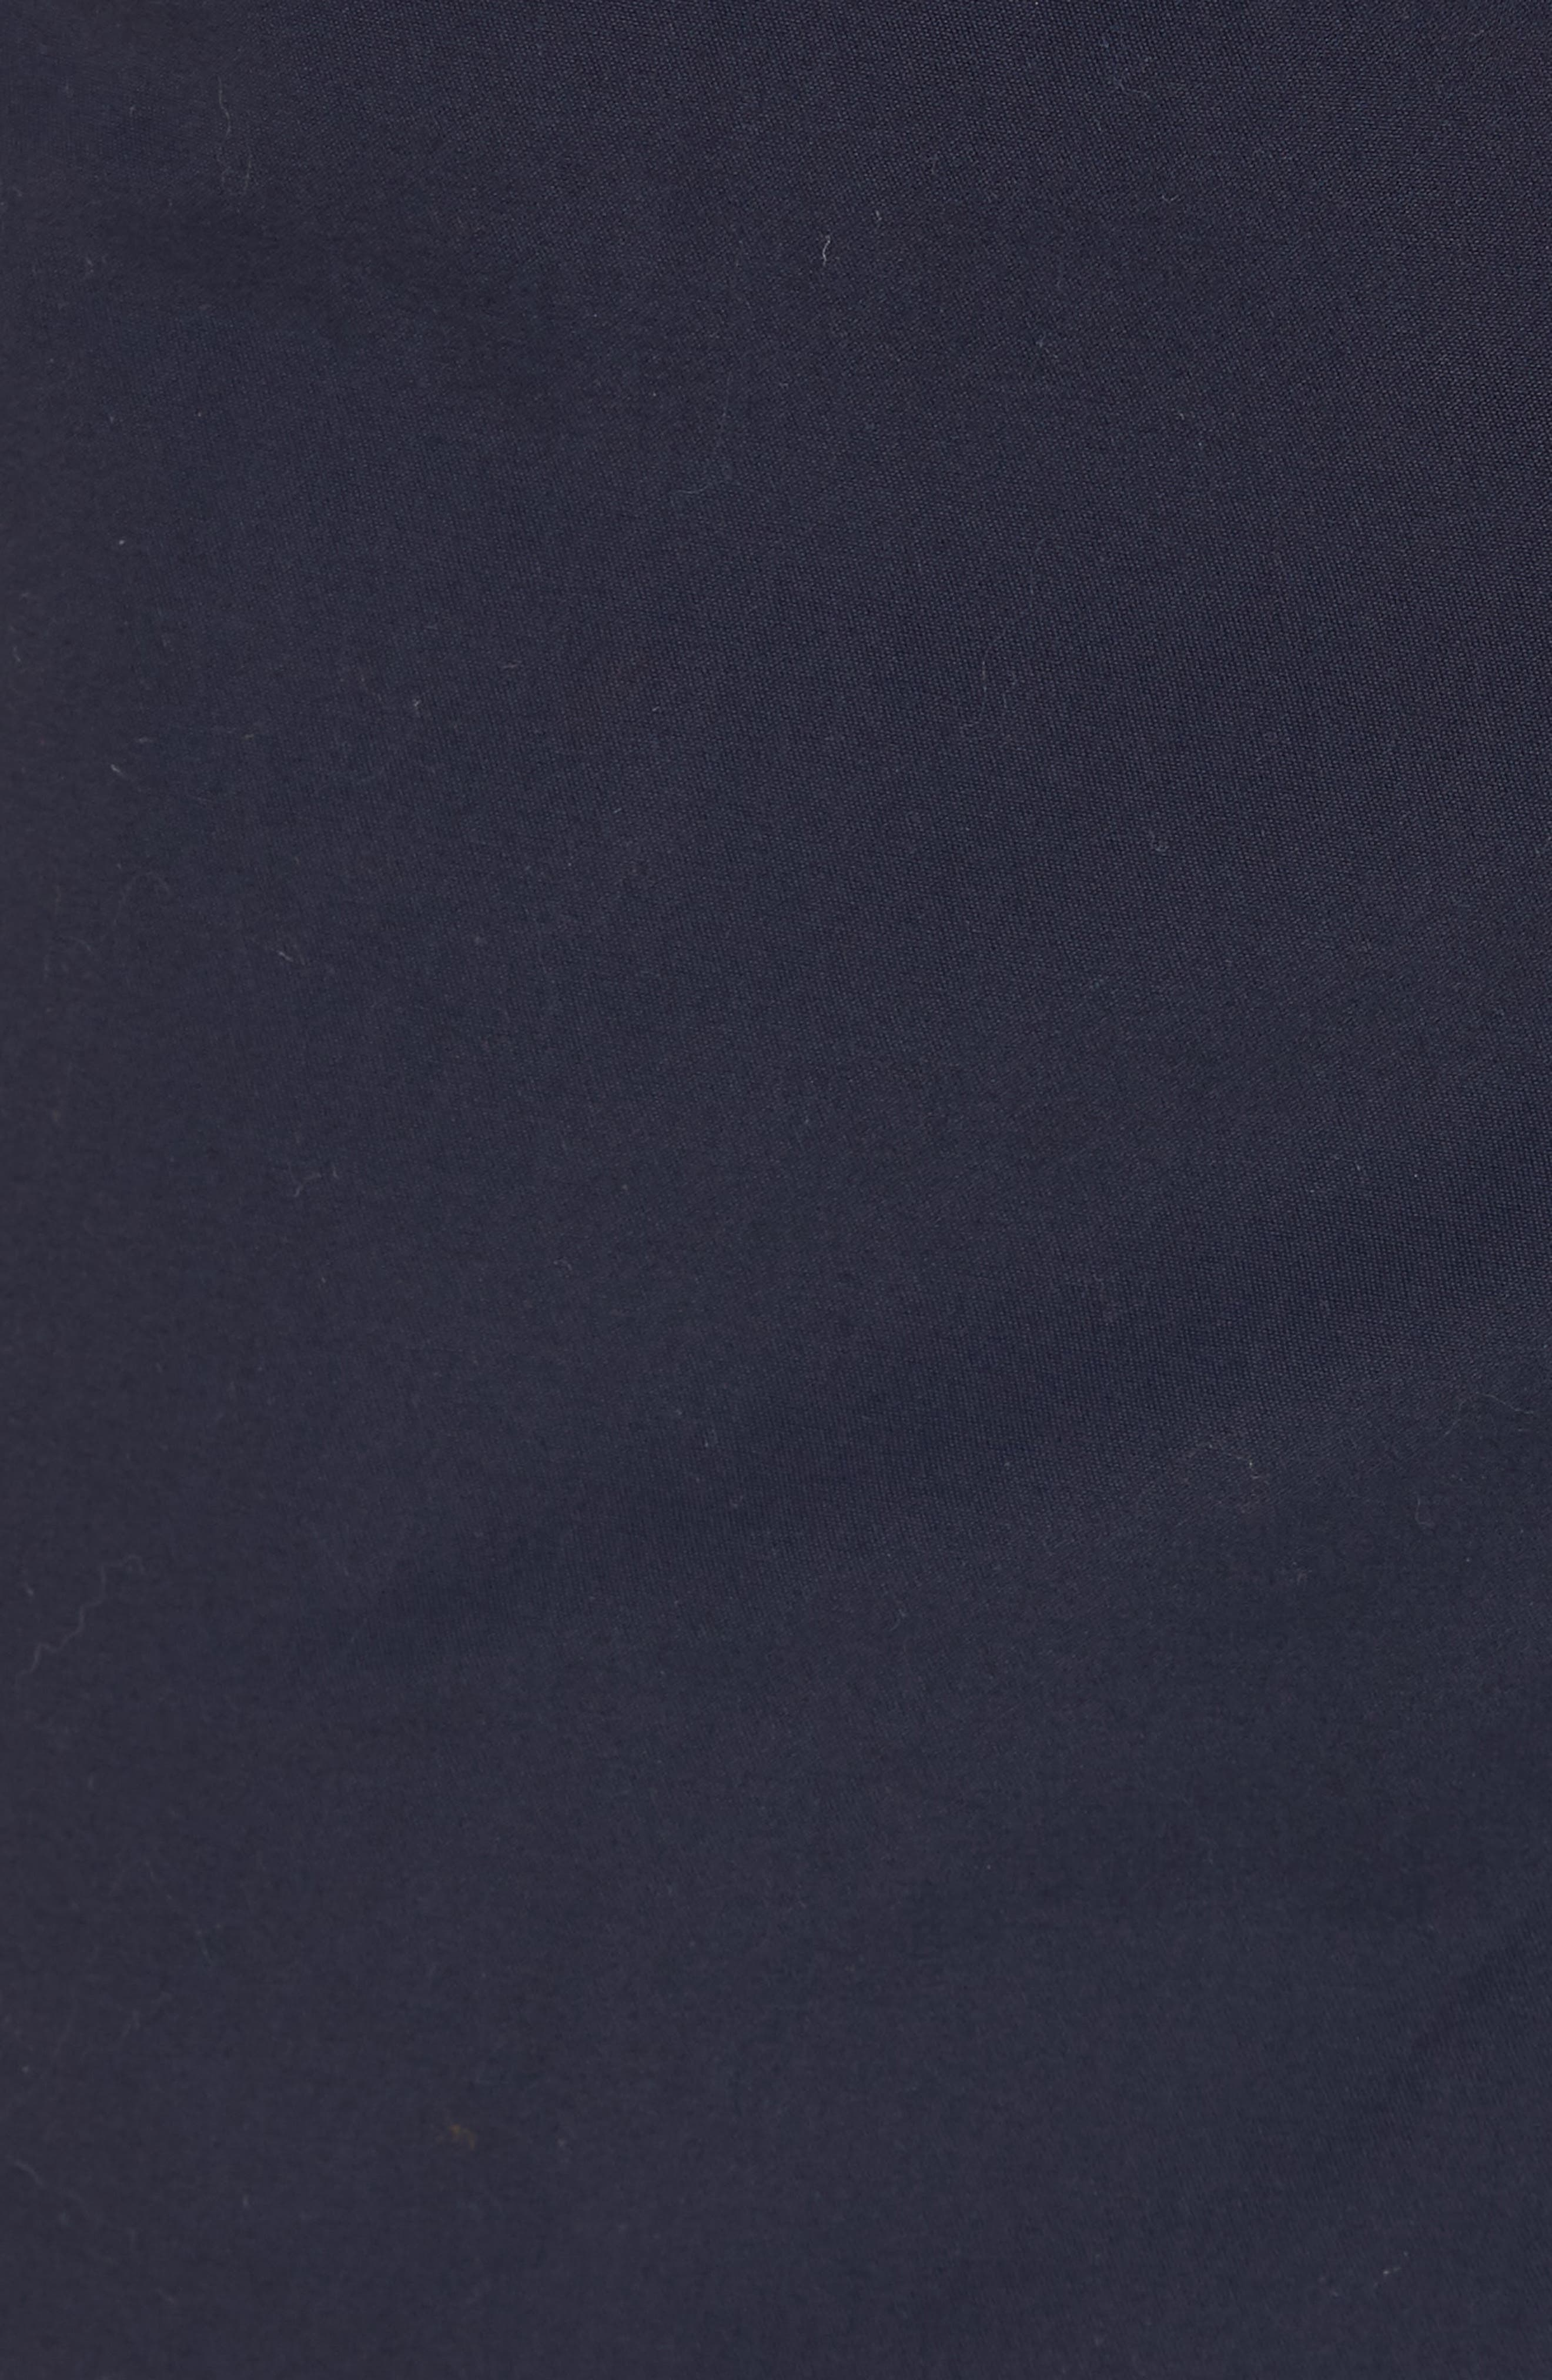 Embroidered Cockatoo Swim Trunks,                             Alternate thumbnail 5, color,                             401